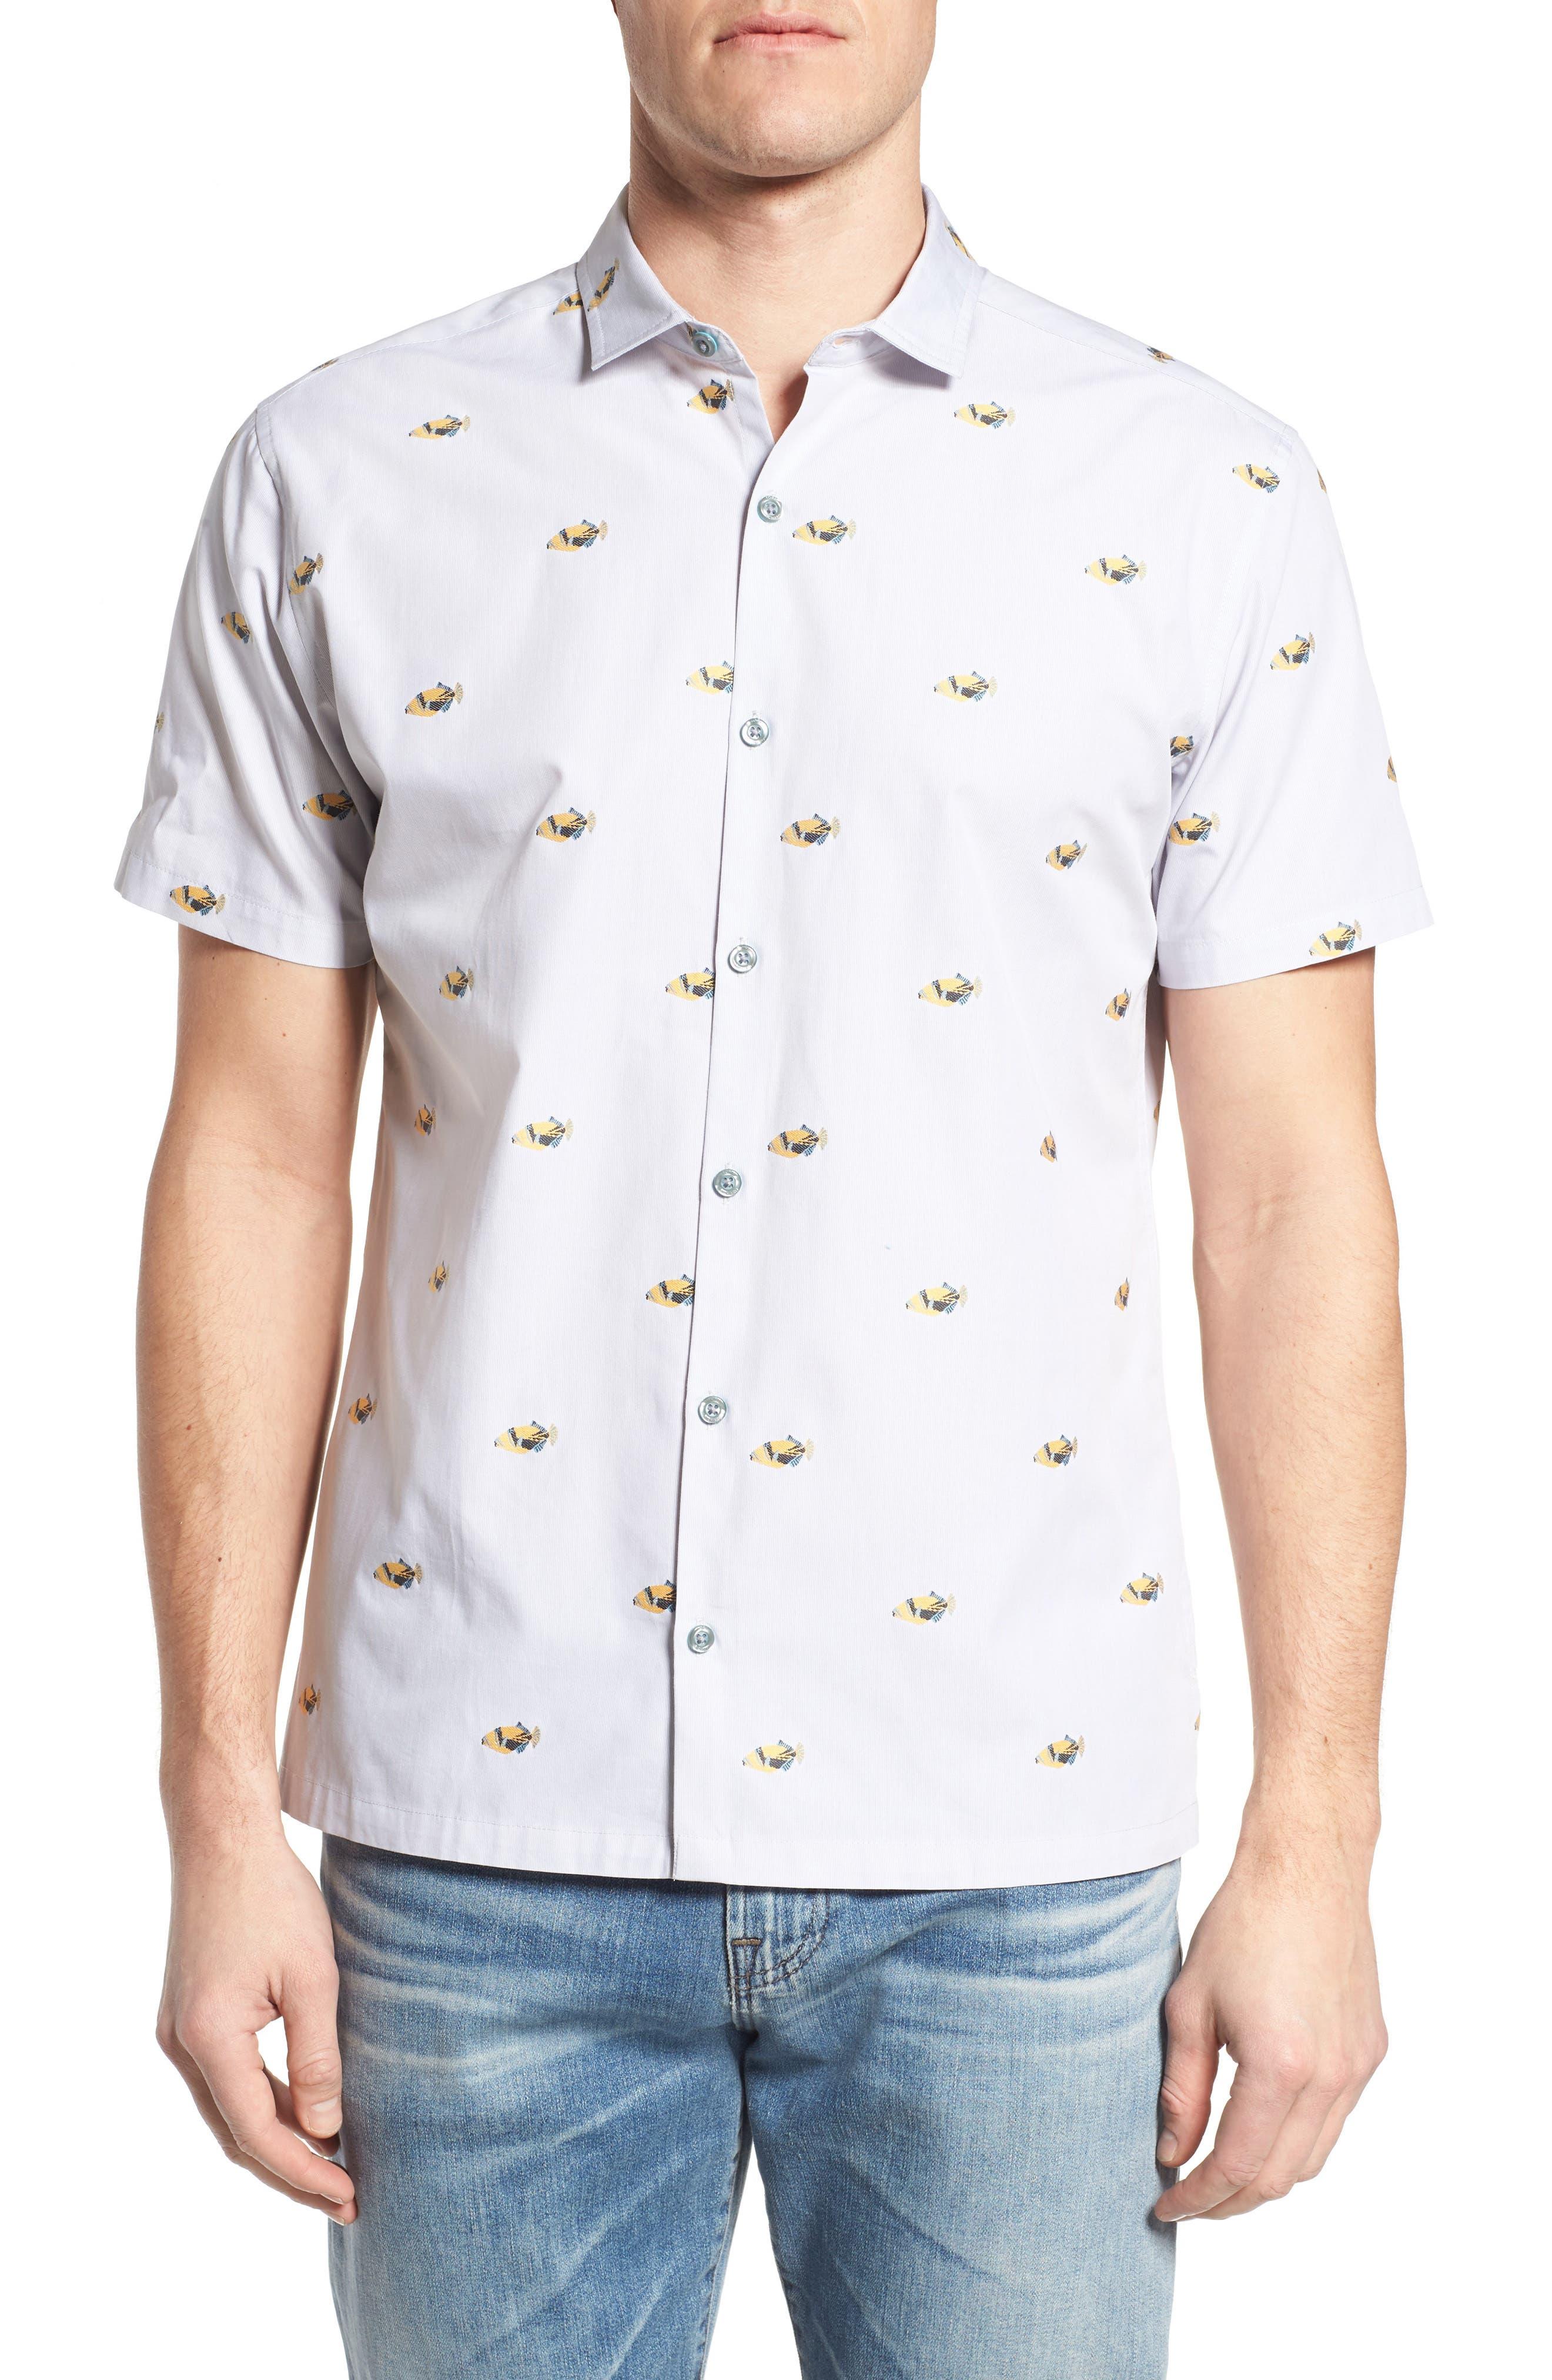 Main Image - Tori Richard 1Humu 2Humu Embroidered Sport Shirt